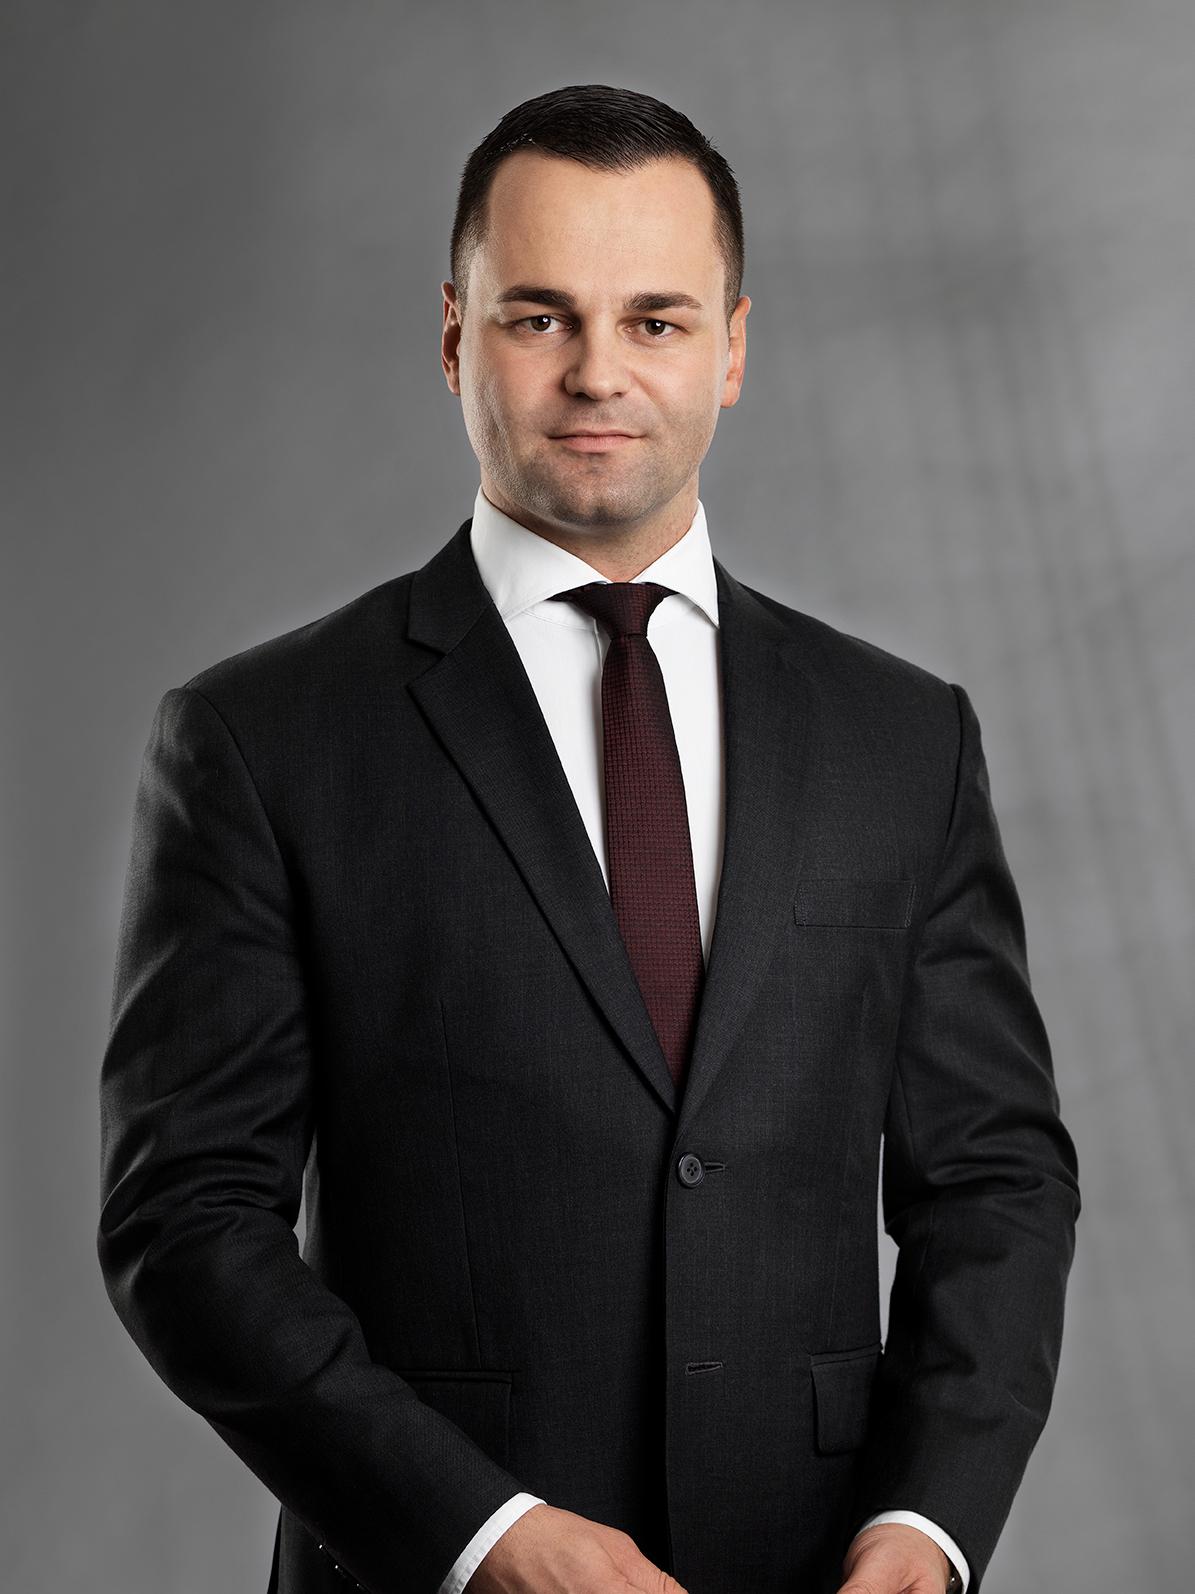 Fabian Akeret